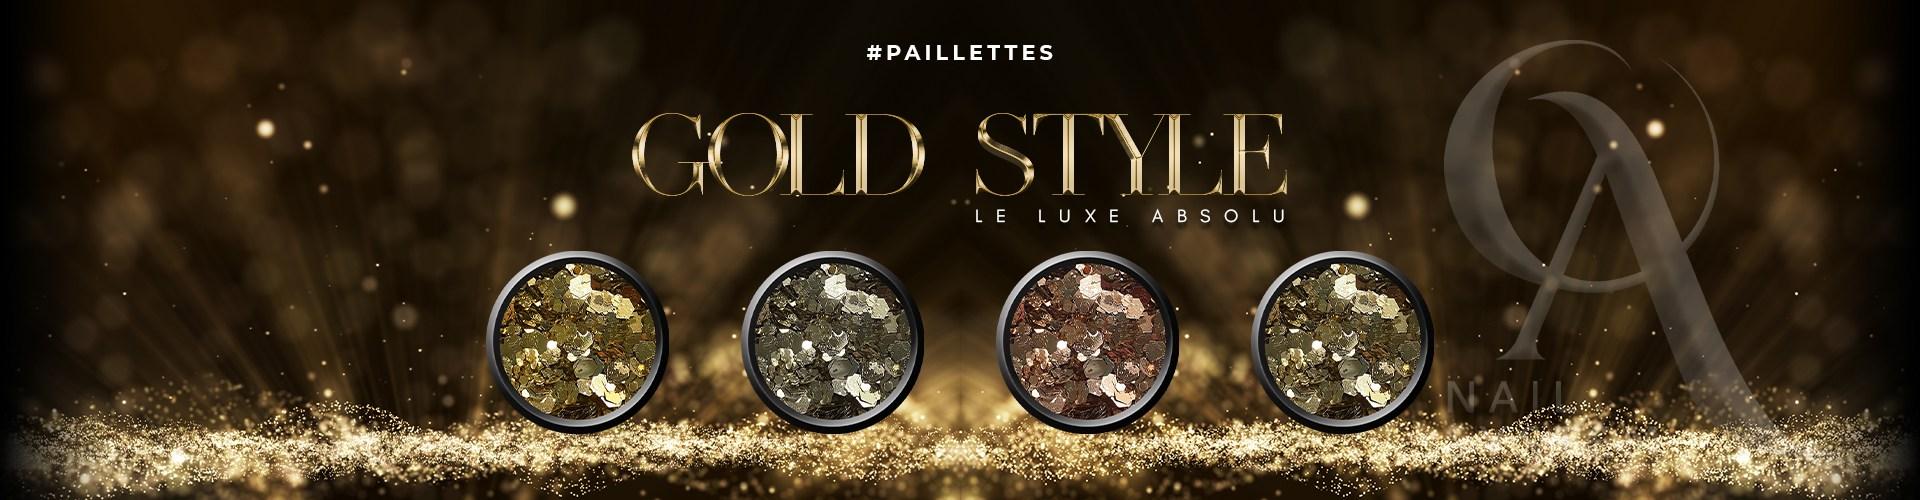 Paillettes Nail Art Gold Style